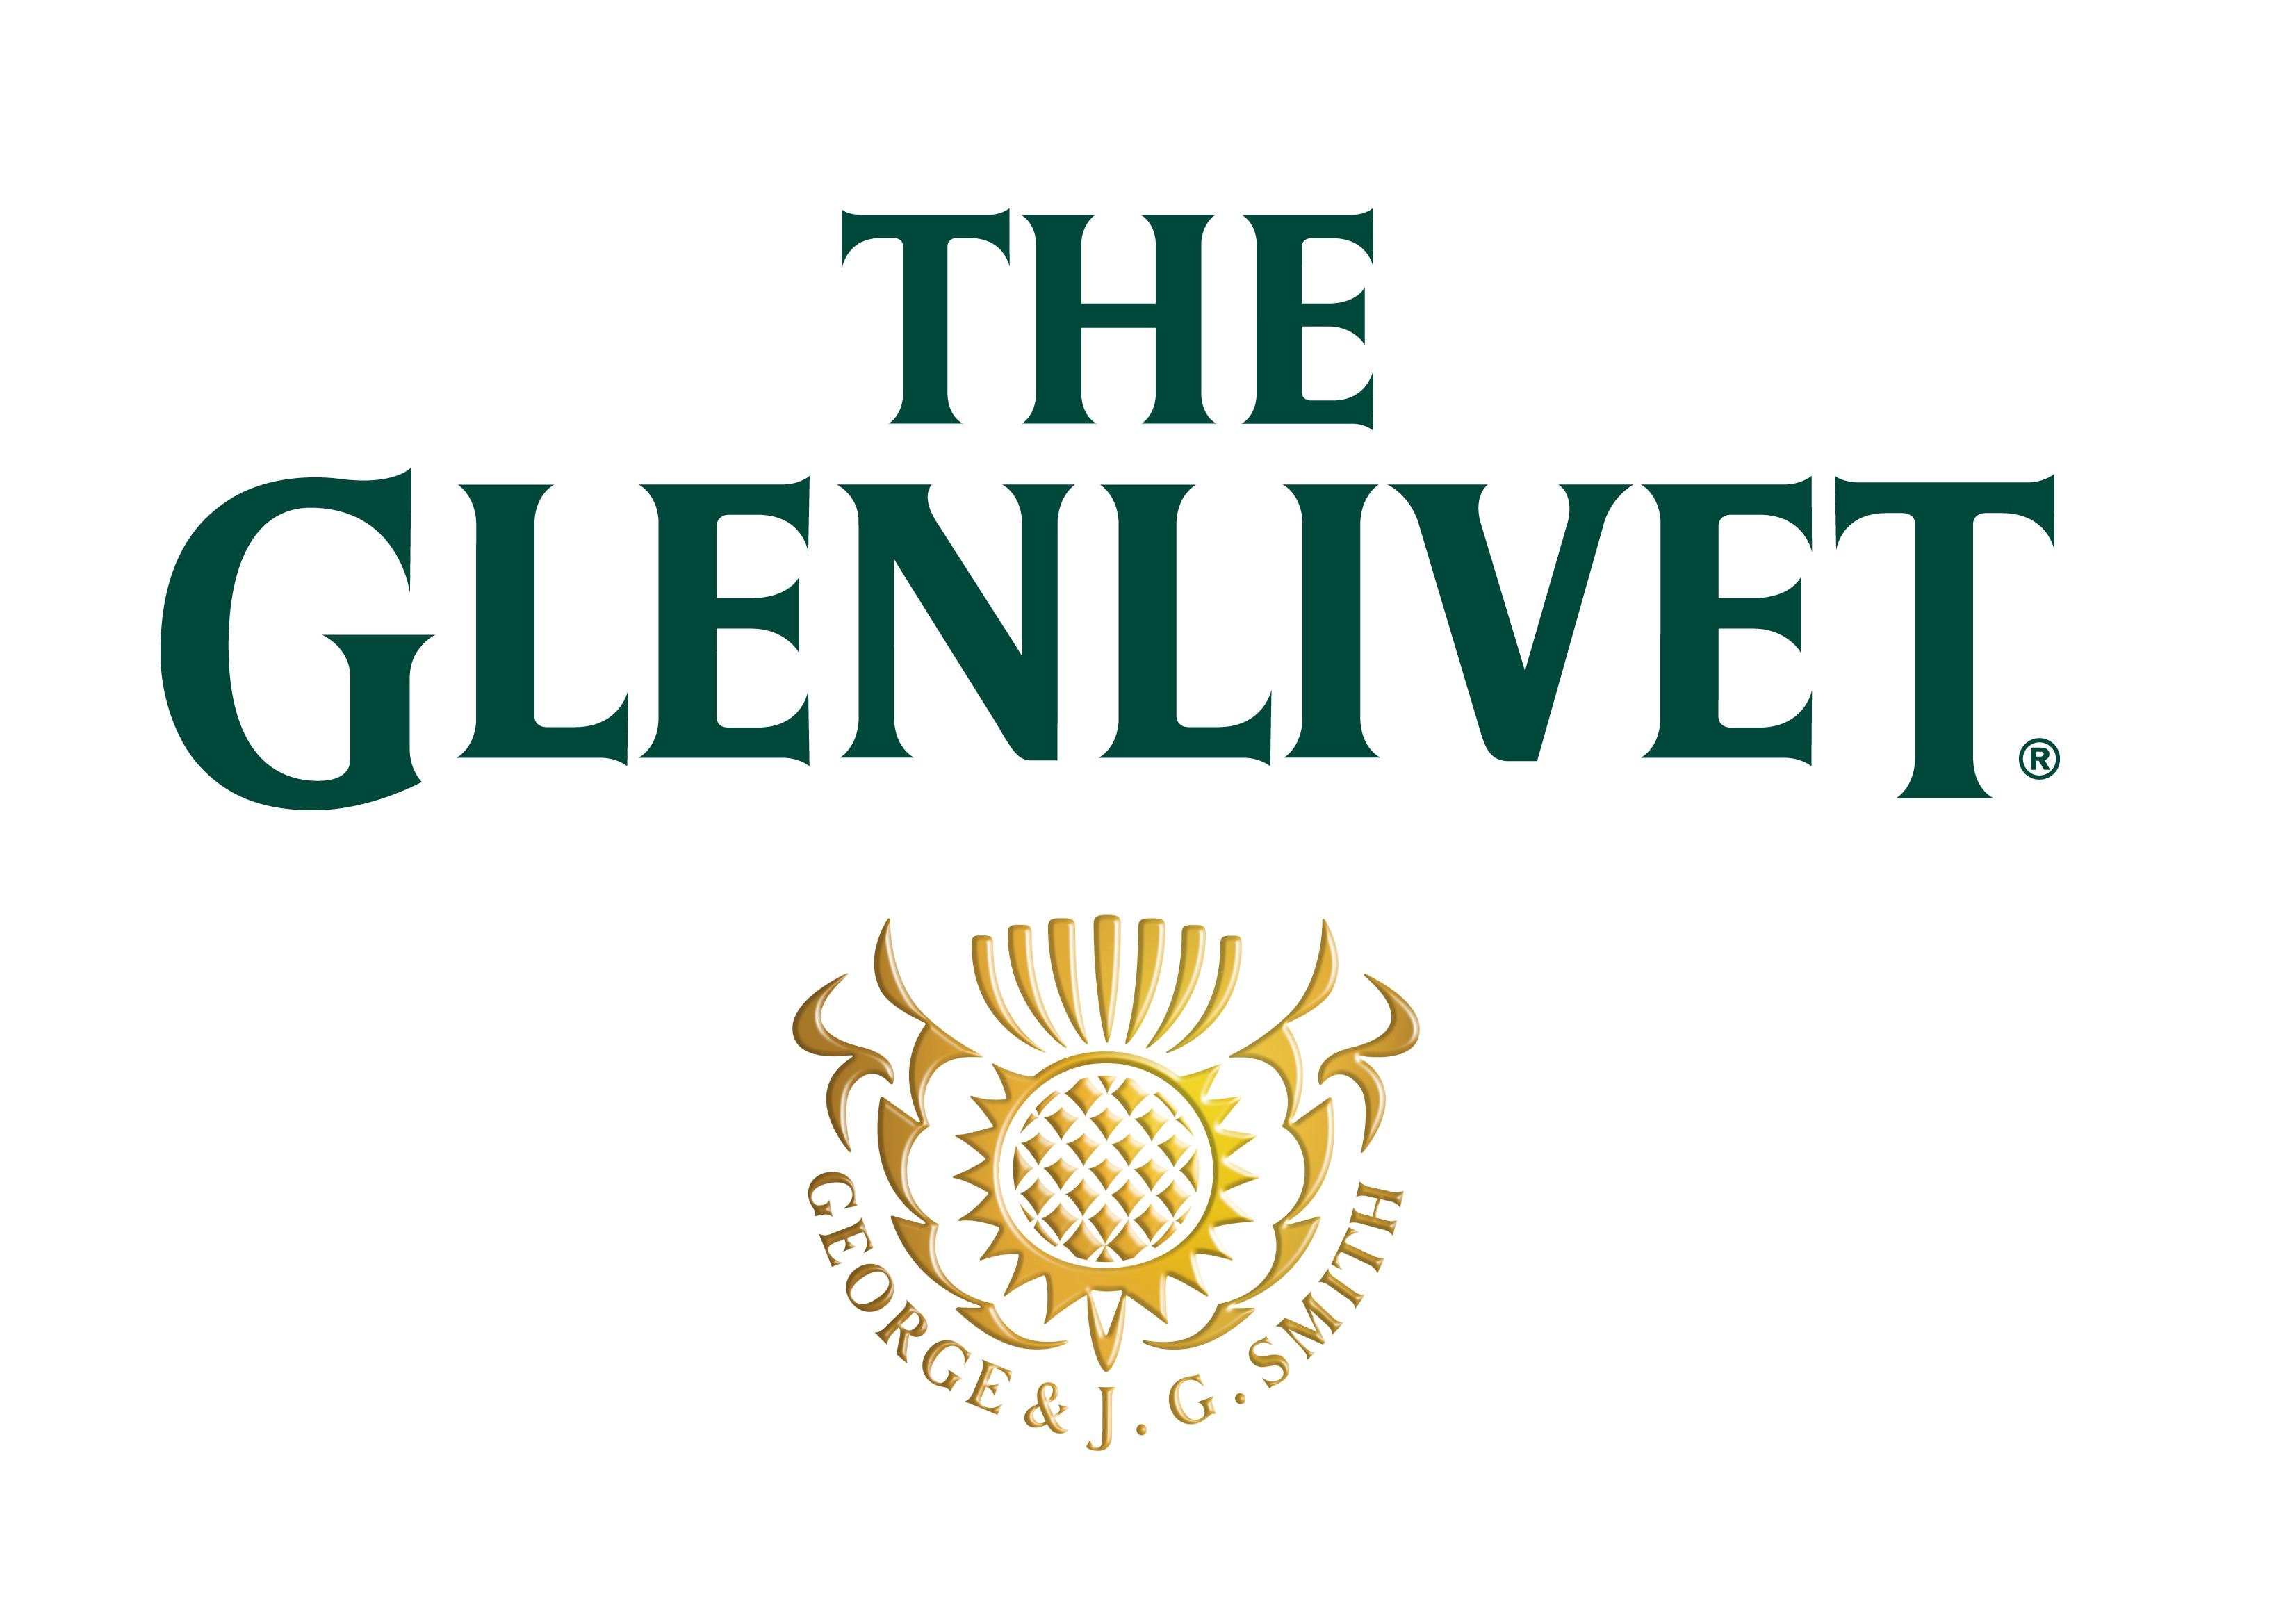 Glenlivet Distillery Ballindalloch Banffshire AB37 9DB / Scotland